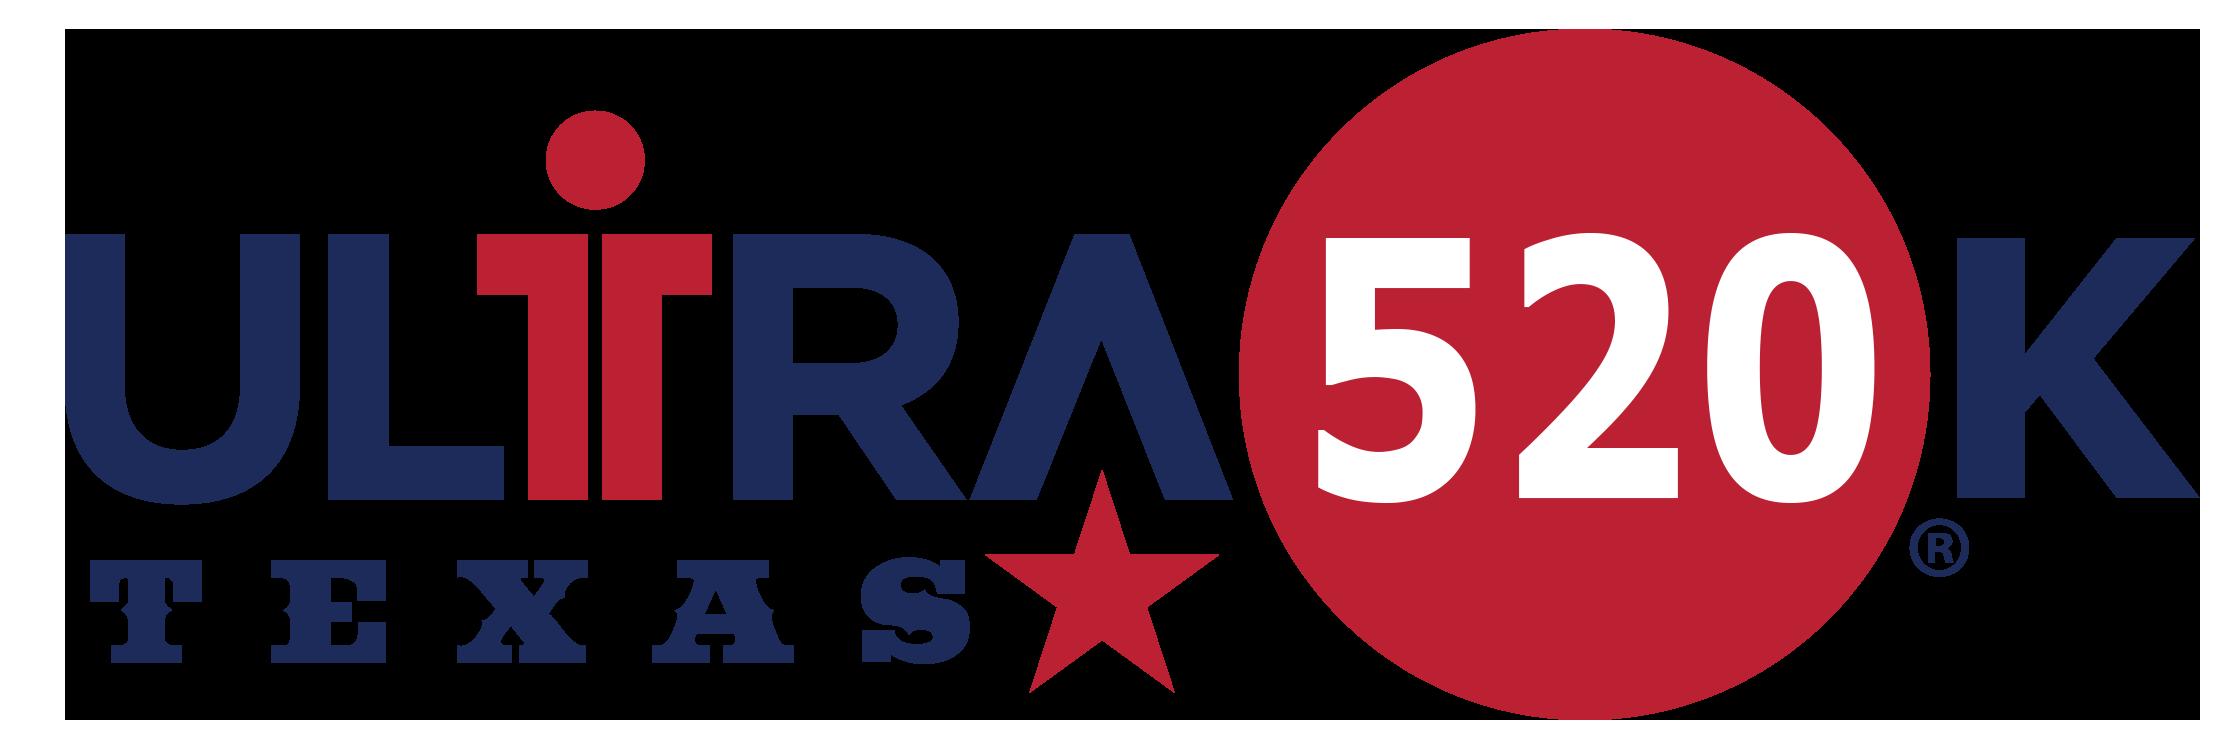 Ultra520K Texas